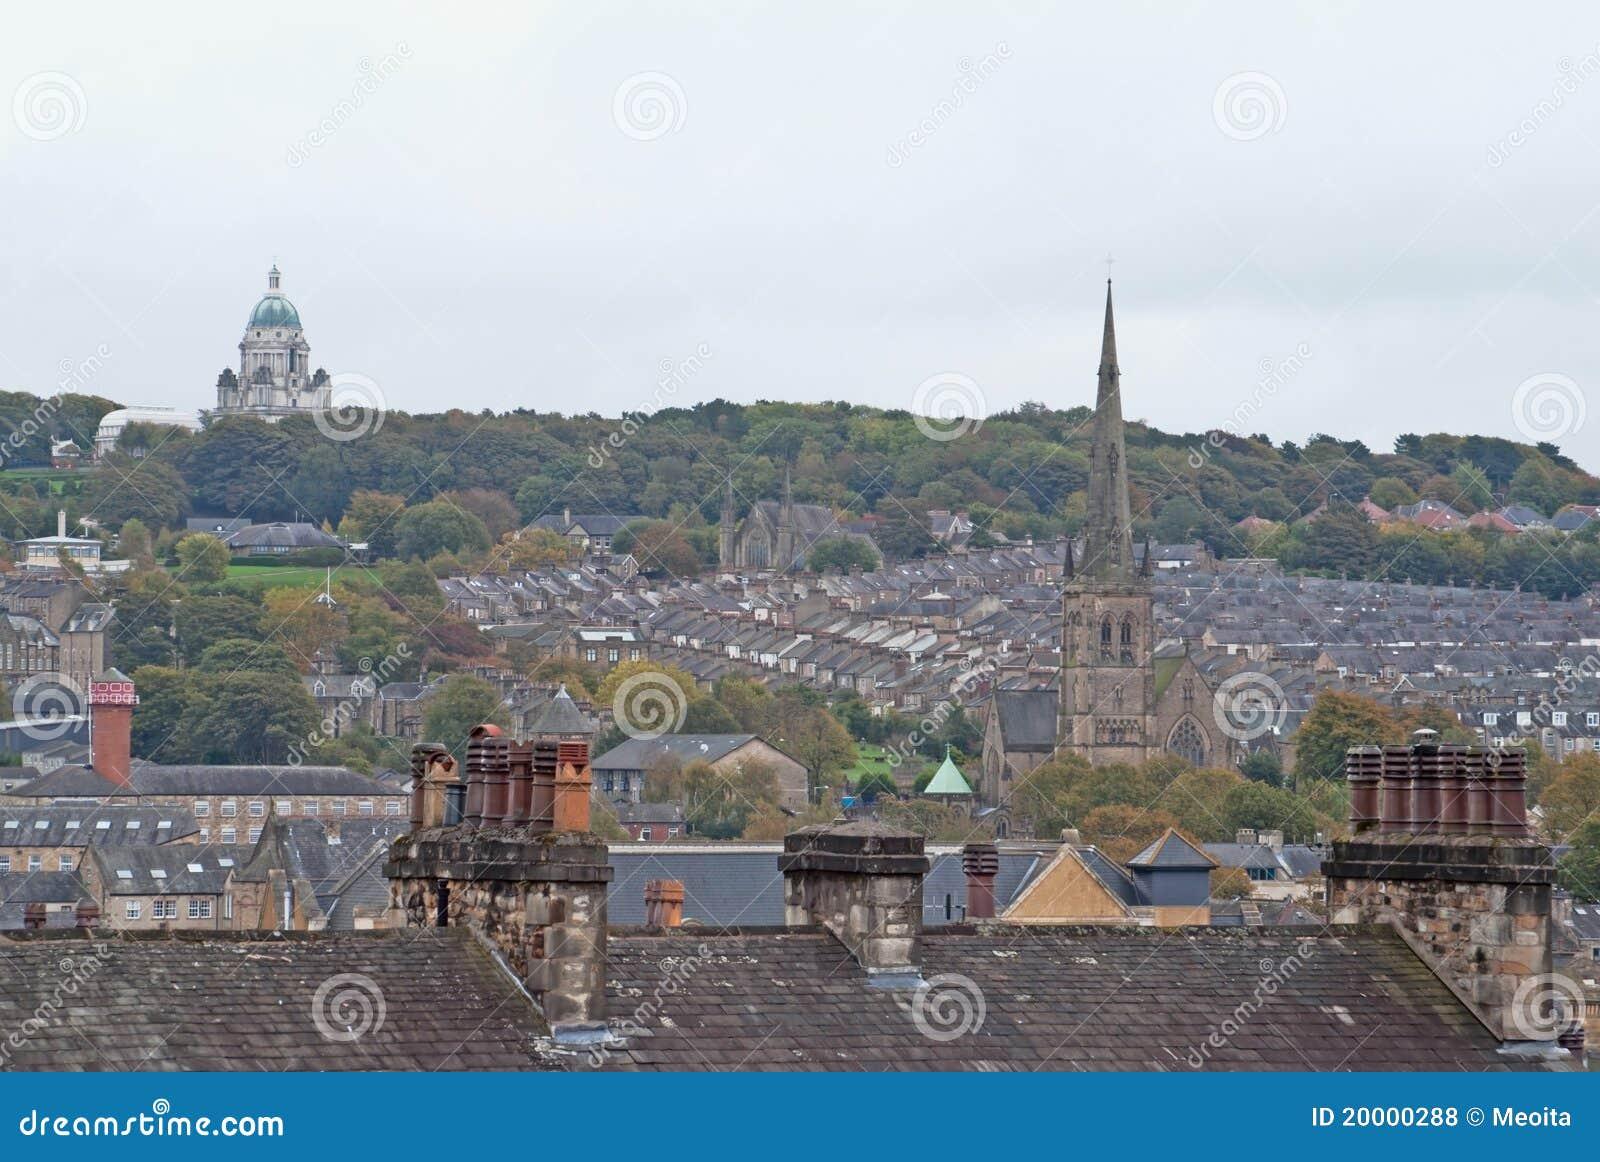 Lancaster city